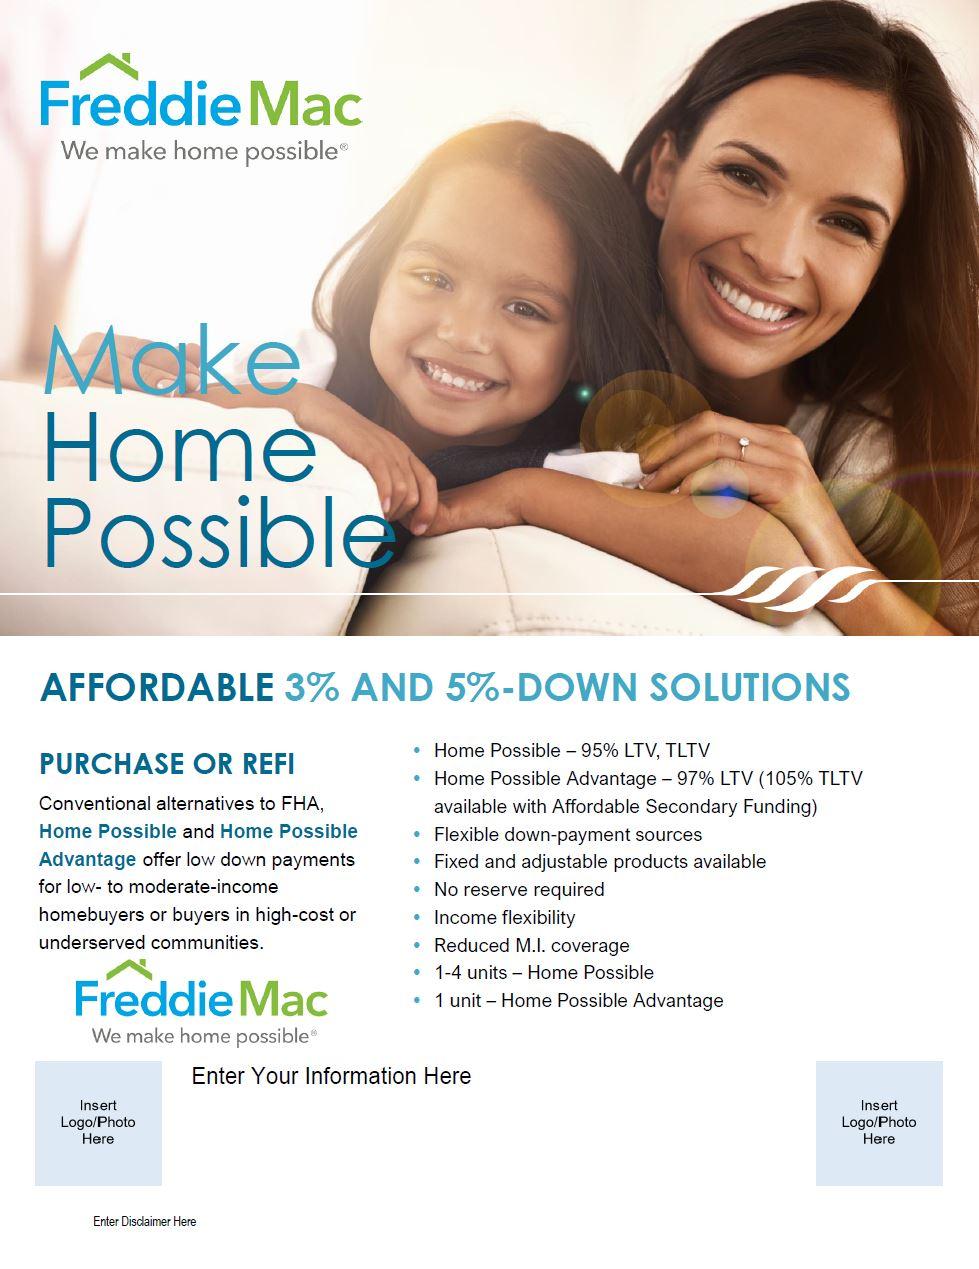 Home Possible Marketing Flyer 10.18 Broker Fillable.JPG